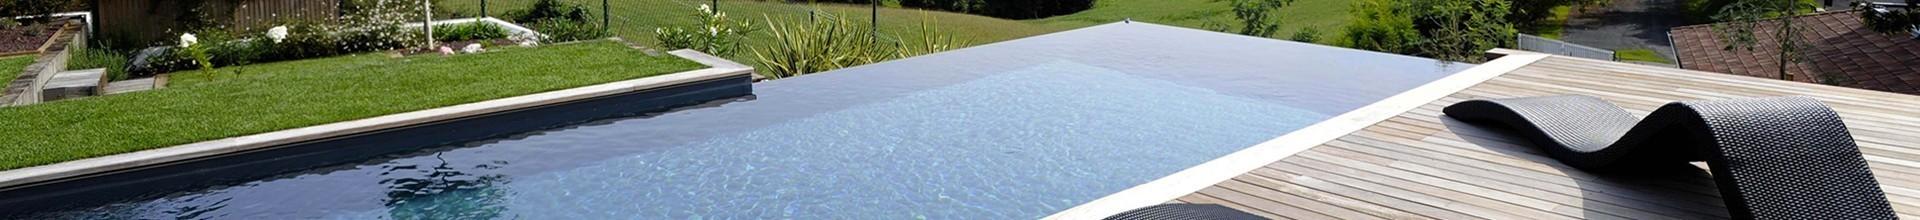 Luxembourg conception conteneur piscine coque sur mesure Rumelange